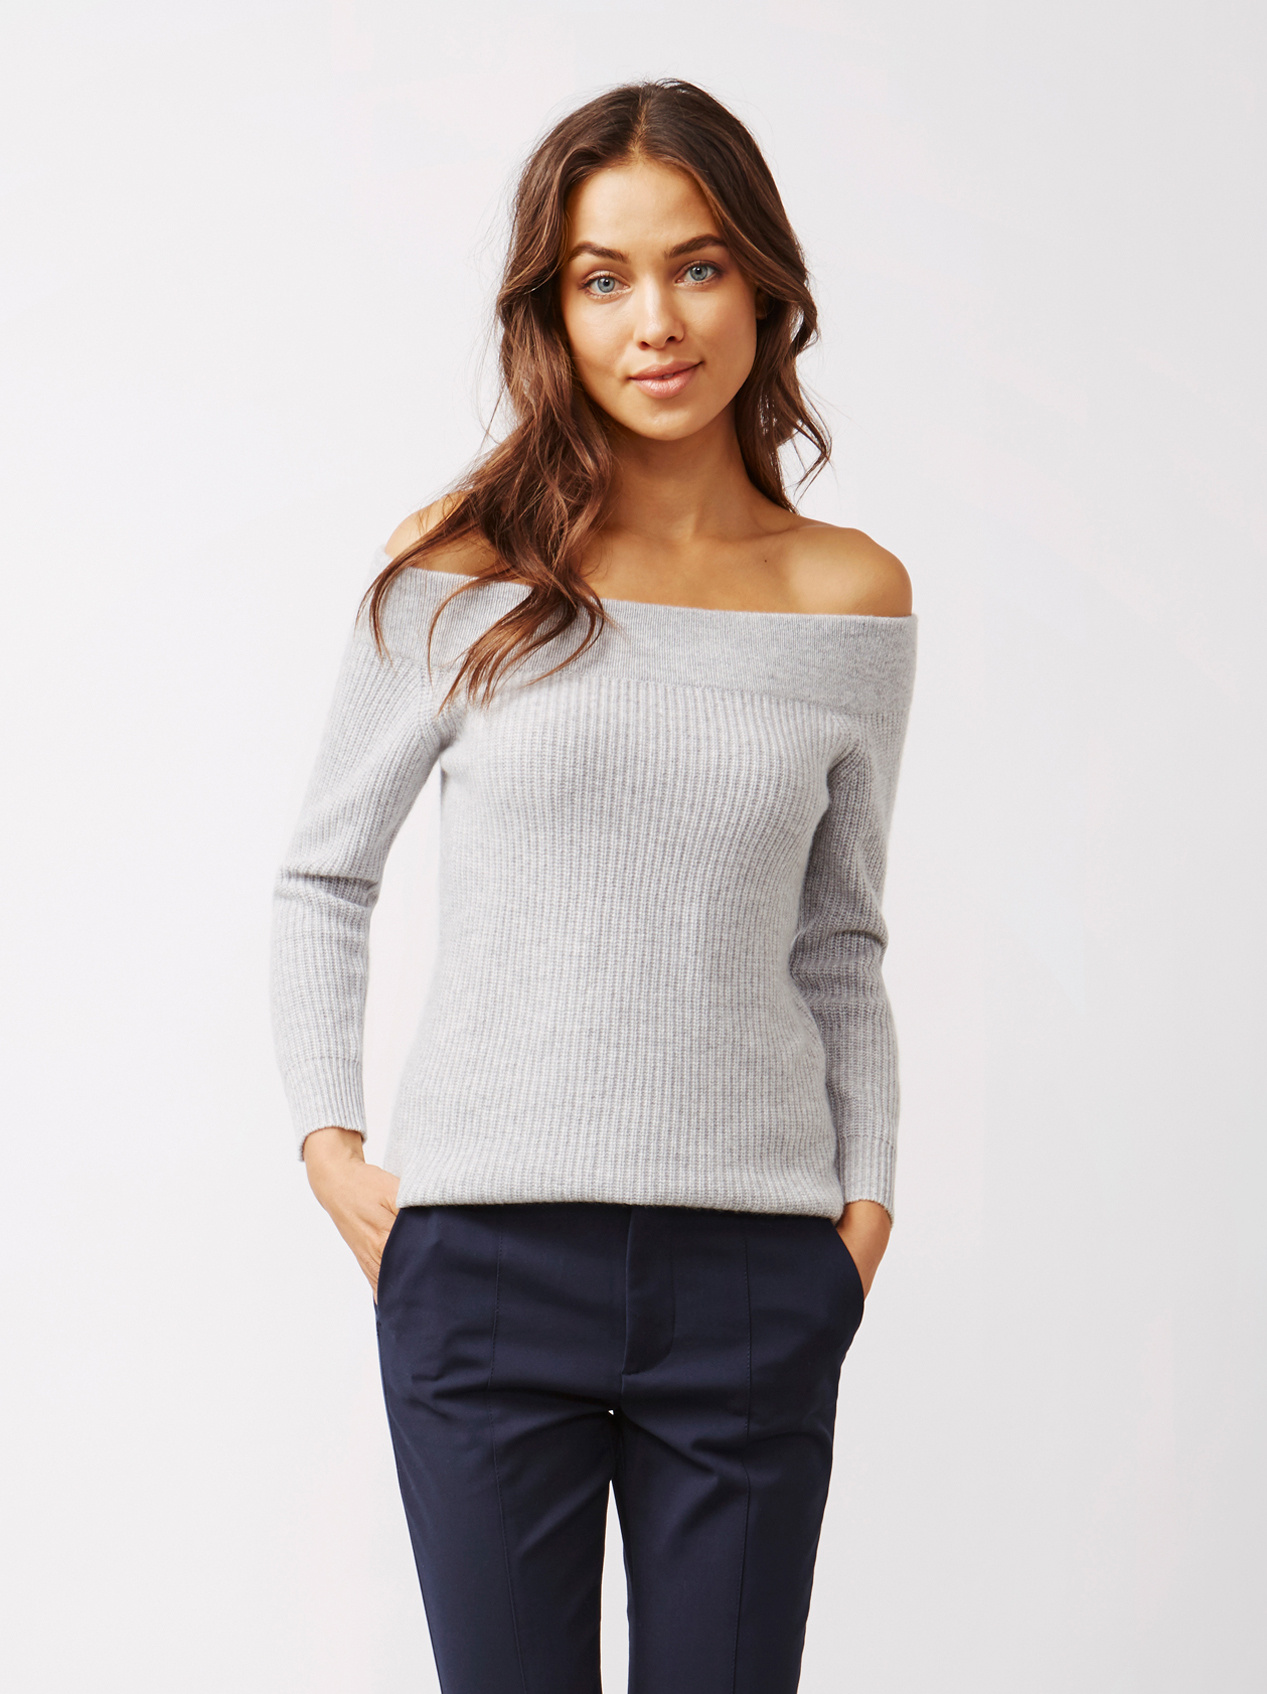 Soft Goat Women's Off Shoulder Sweater Light Grey